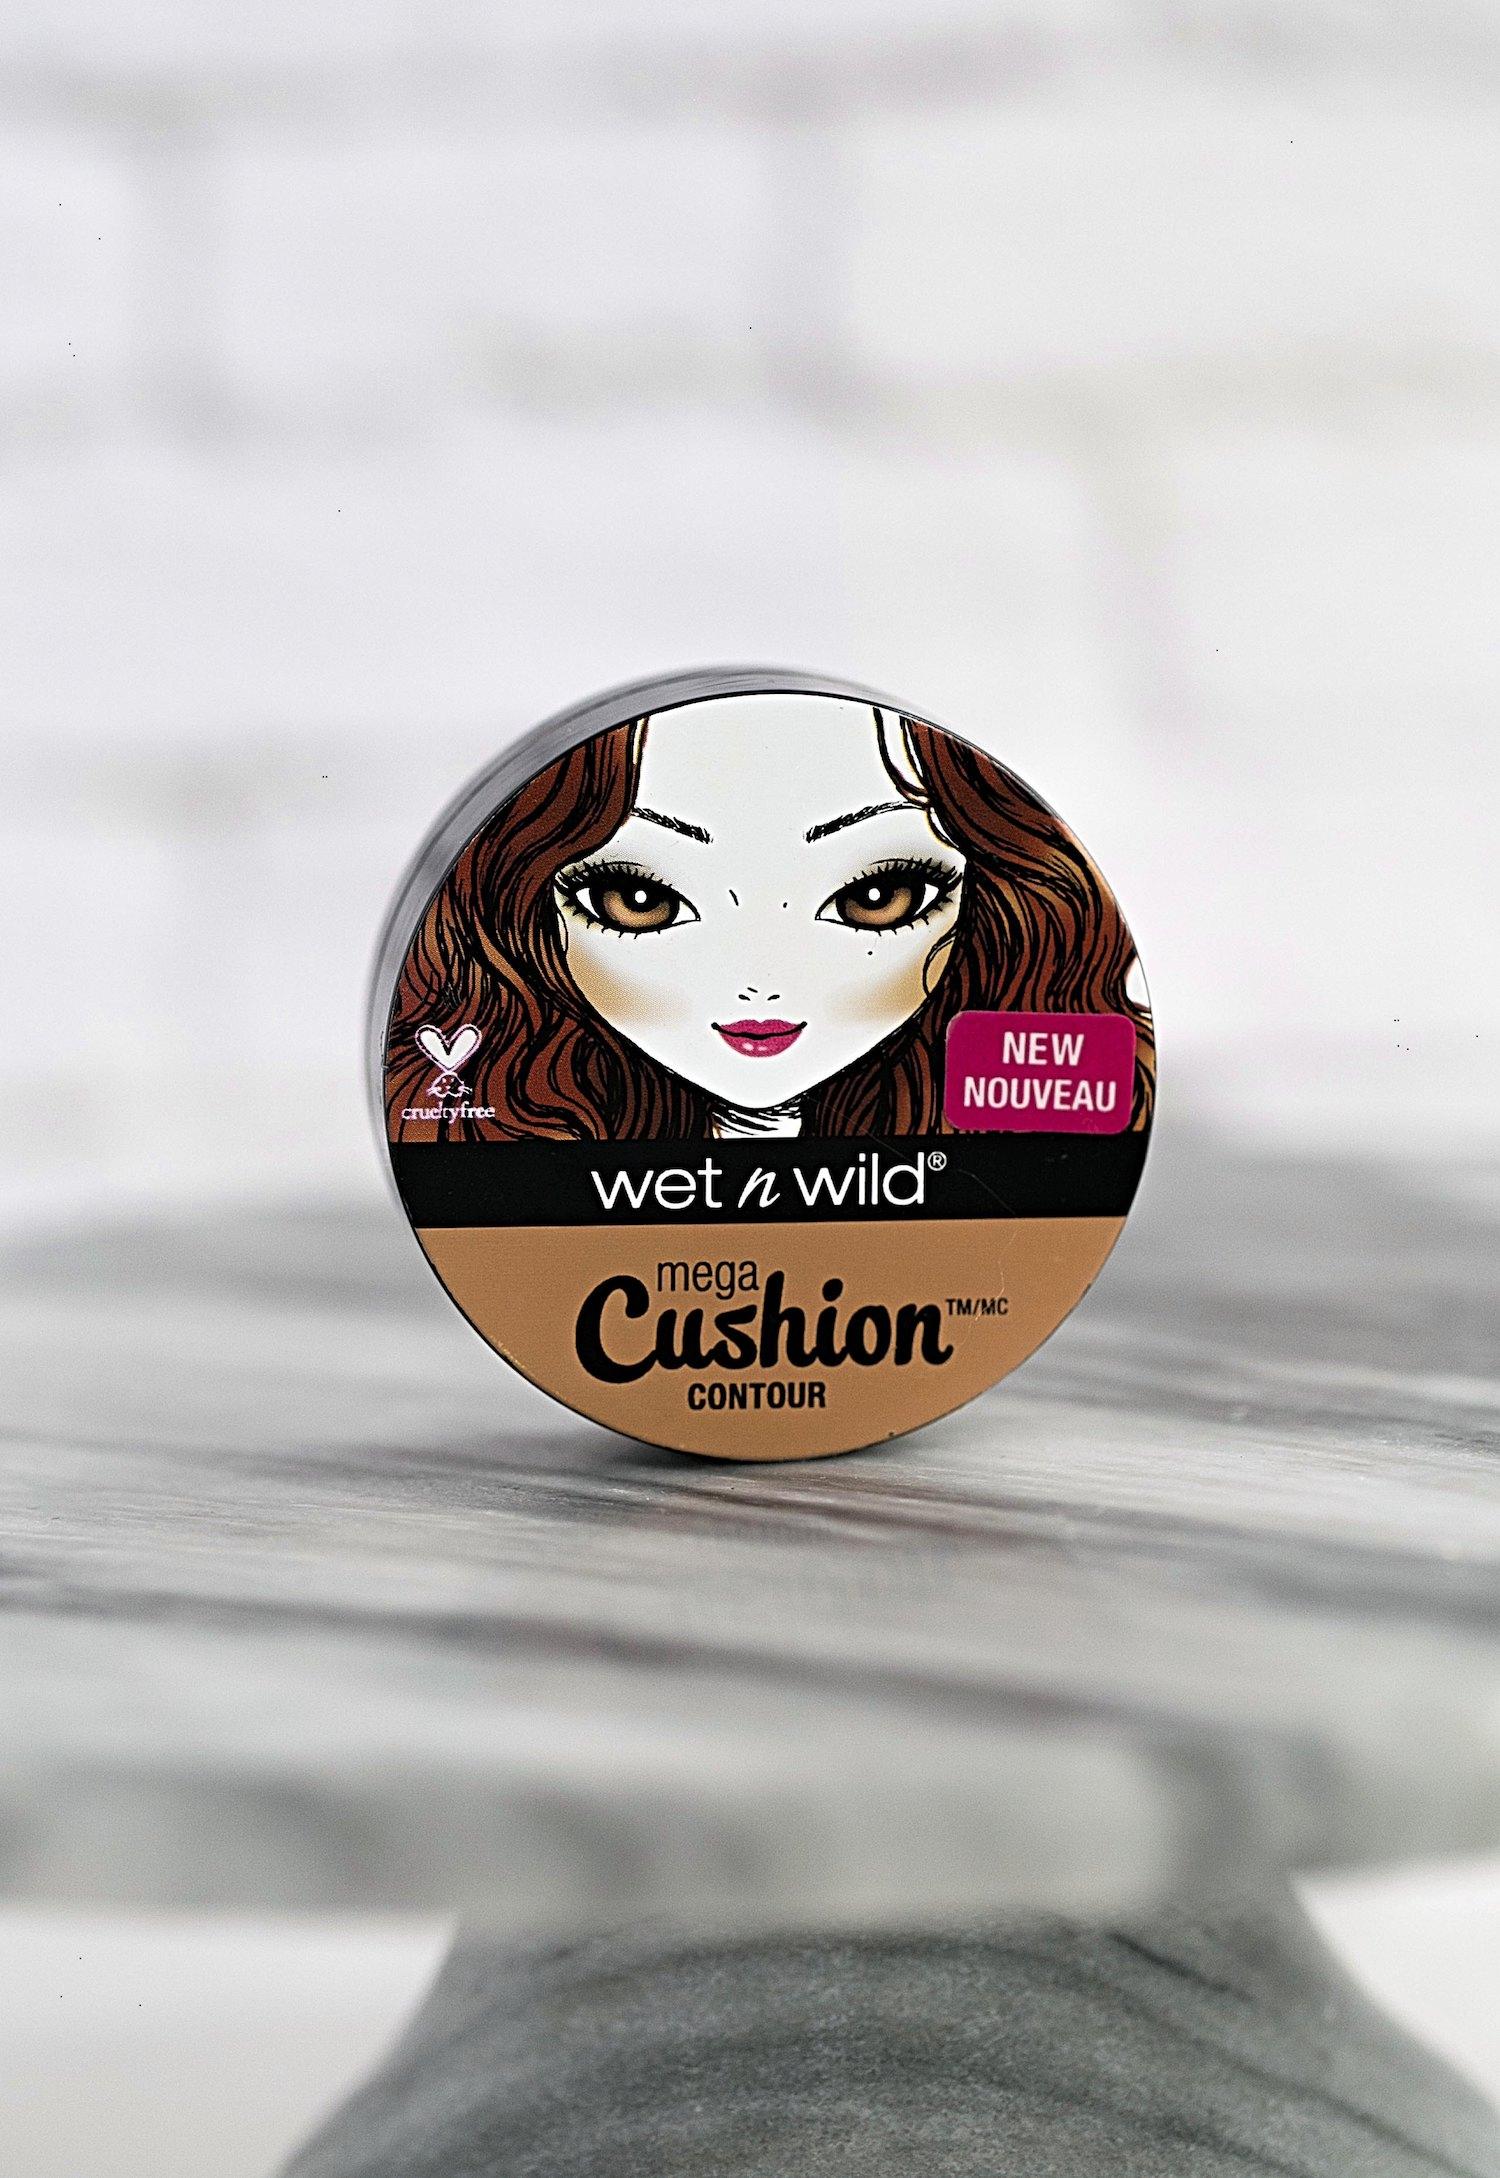 New Favorite Beauty Buys- Wet n Wild Cushion Contour | TrufflesandTrends.com